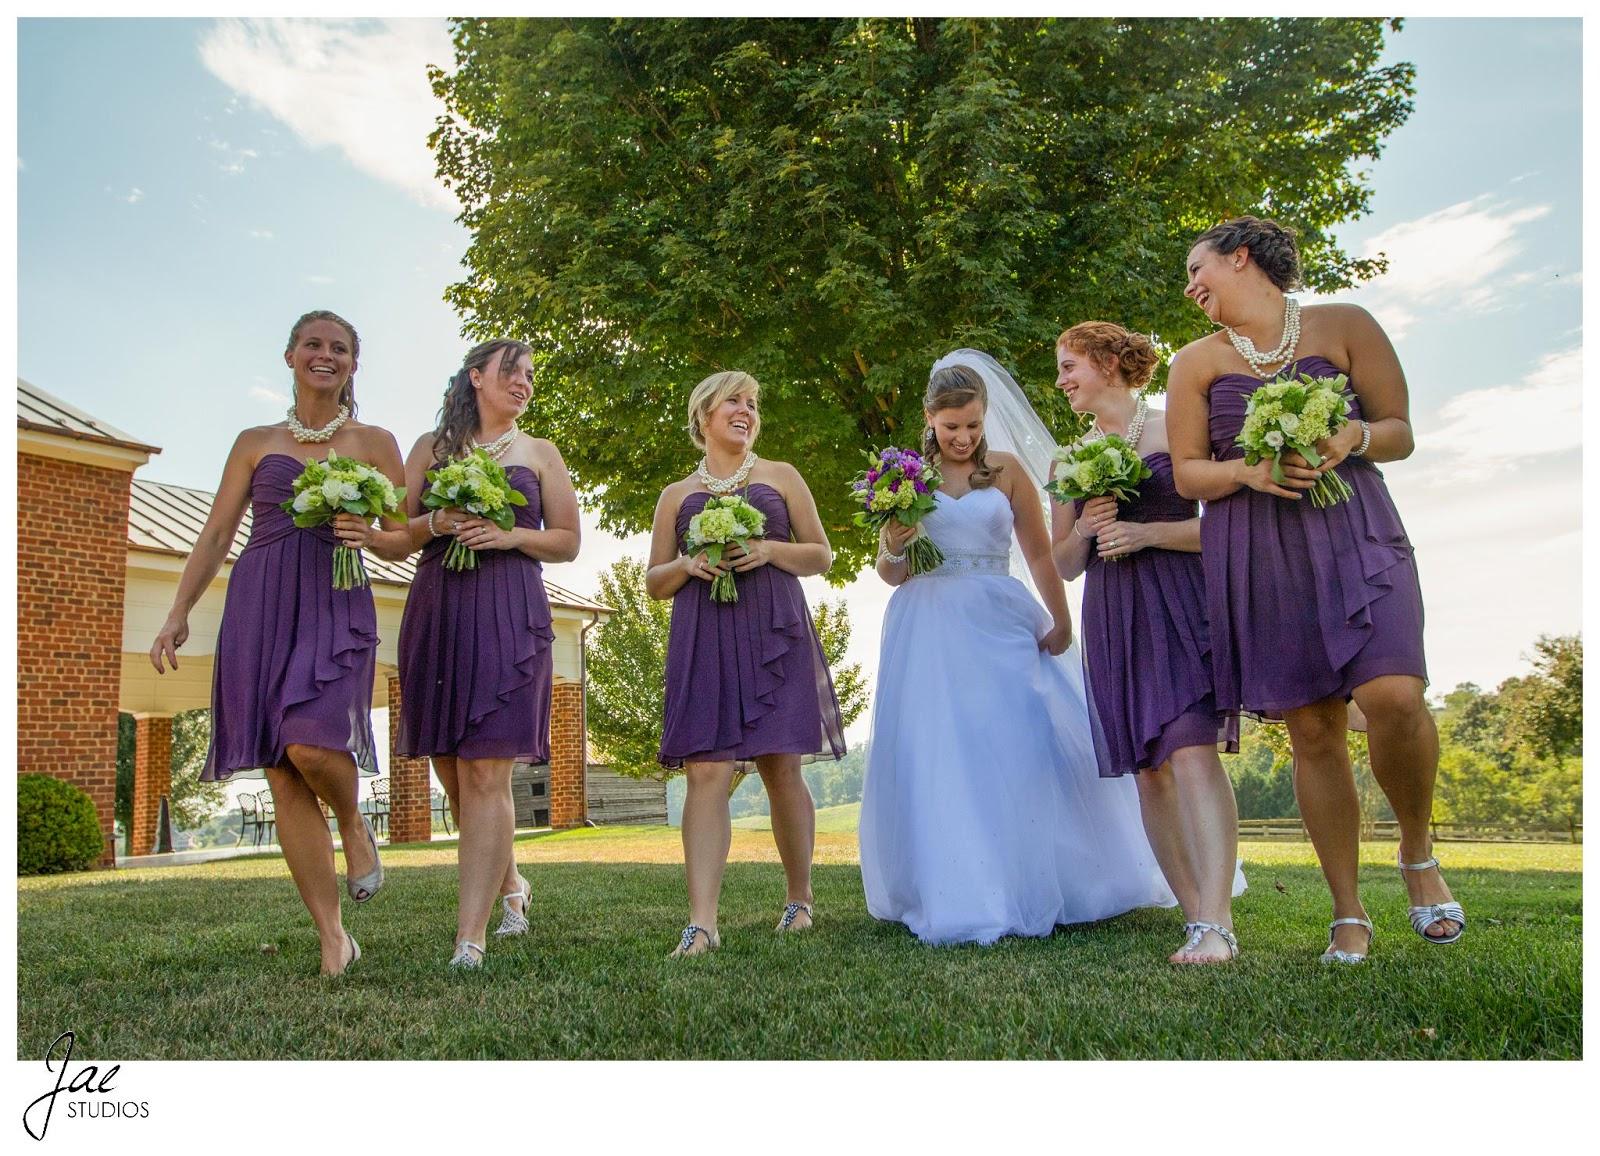 Jonathan and Julie, Bird cage, West Manor Estate, Wedding, Lynchburg, Virginia, Jae Studios, purple, wedding dress, bridesmaids, veil, flowers, bouquet, walking, pearl, necklaces